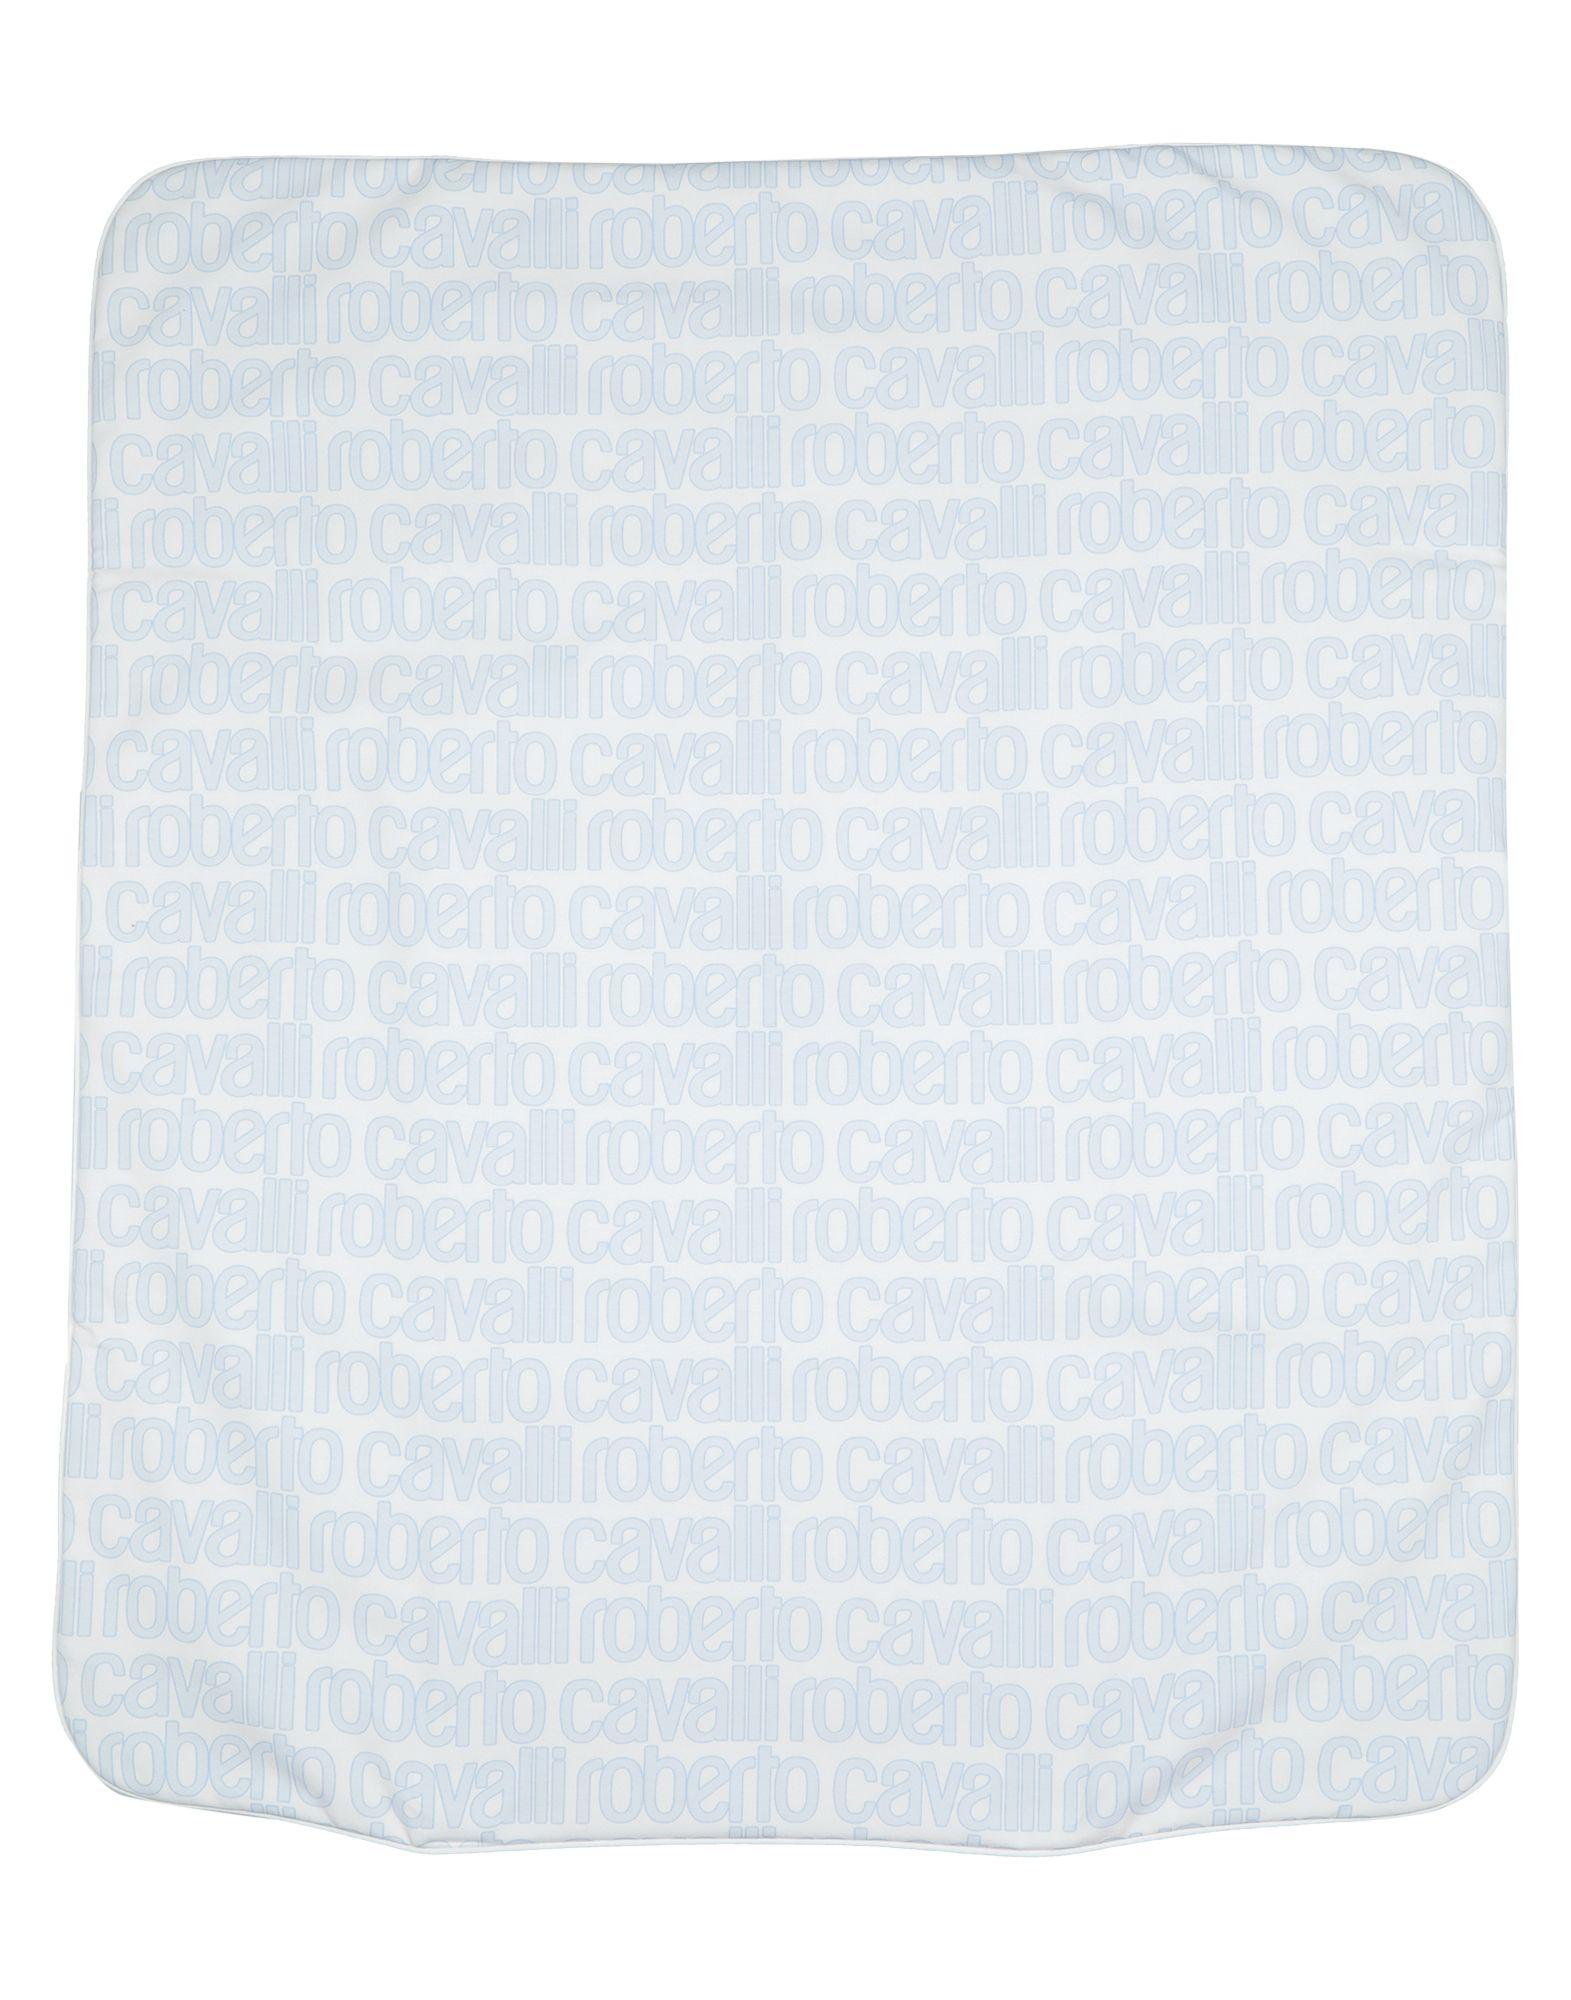 ROBERTO CAVALLI Одеяльце для младенцев круг для купания младенцев flipper отзывы